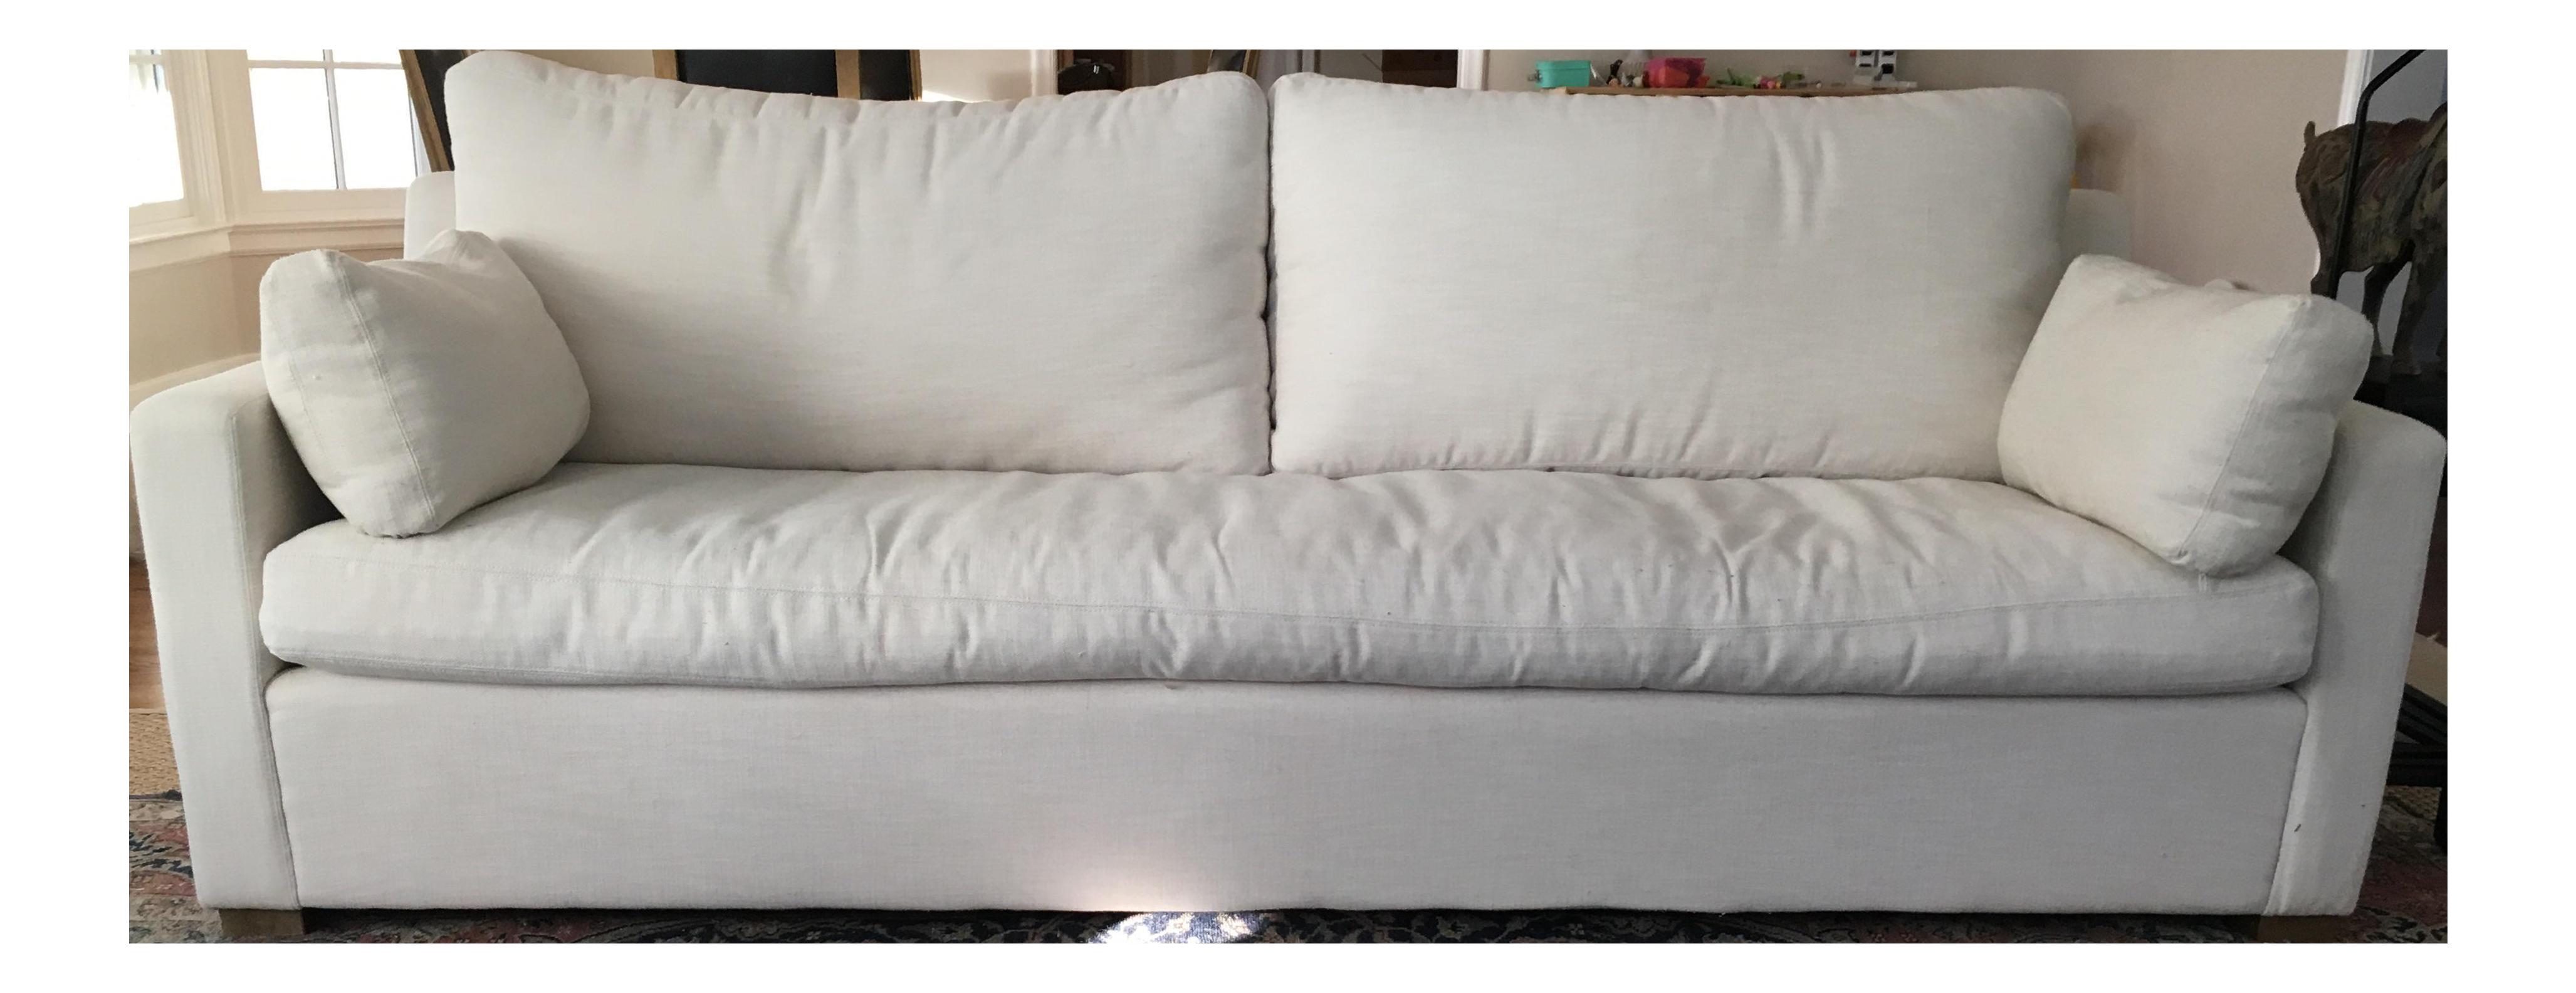 Restoration Hardware Belgian Track Arm Sofa